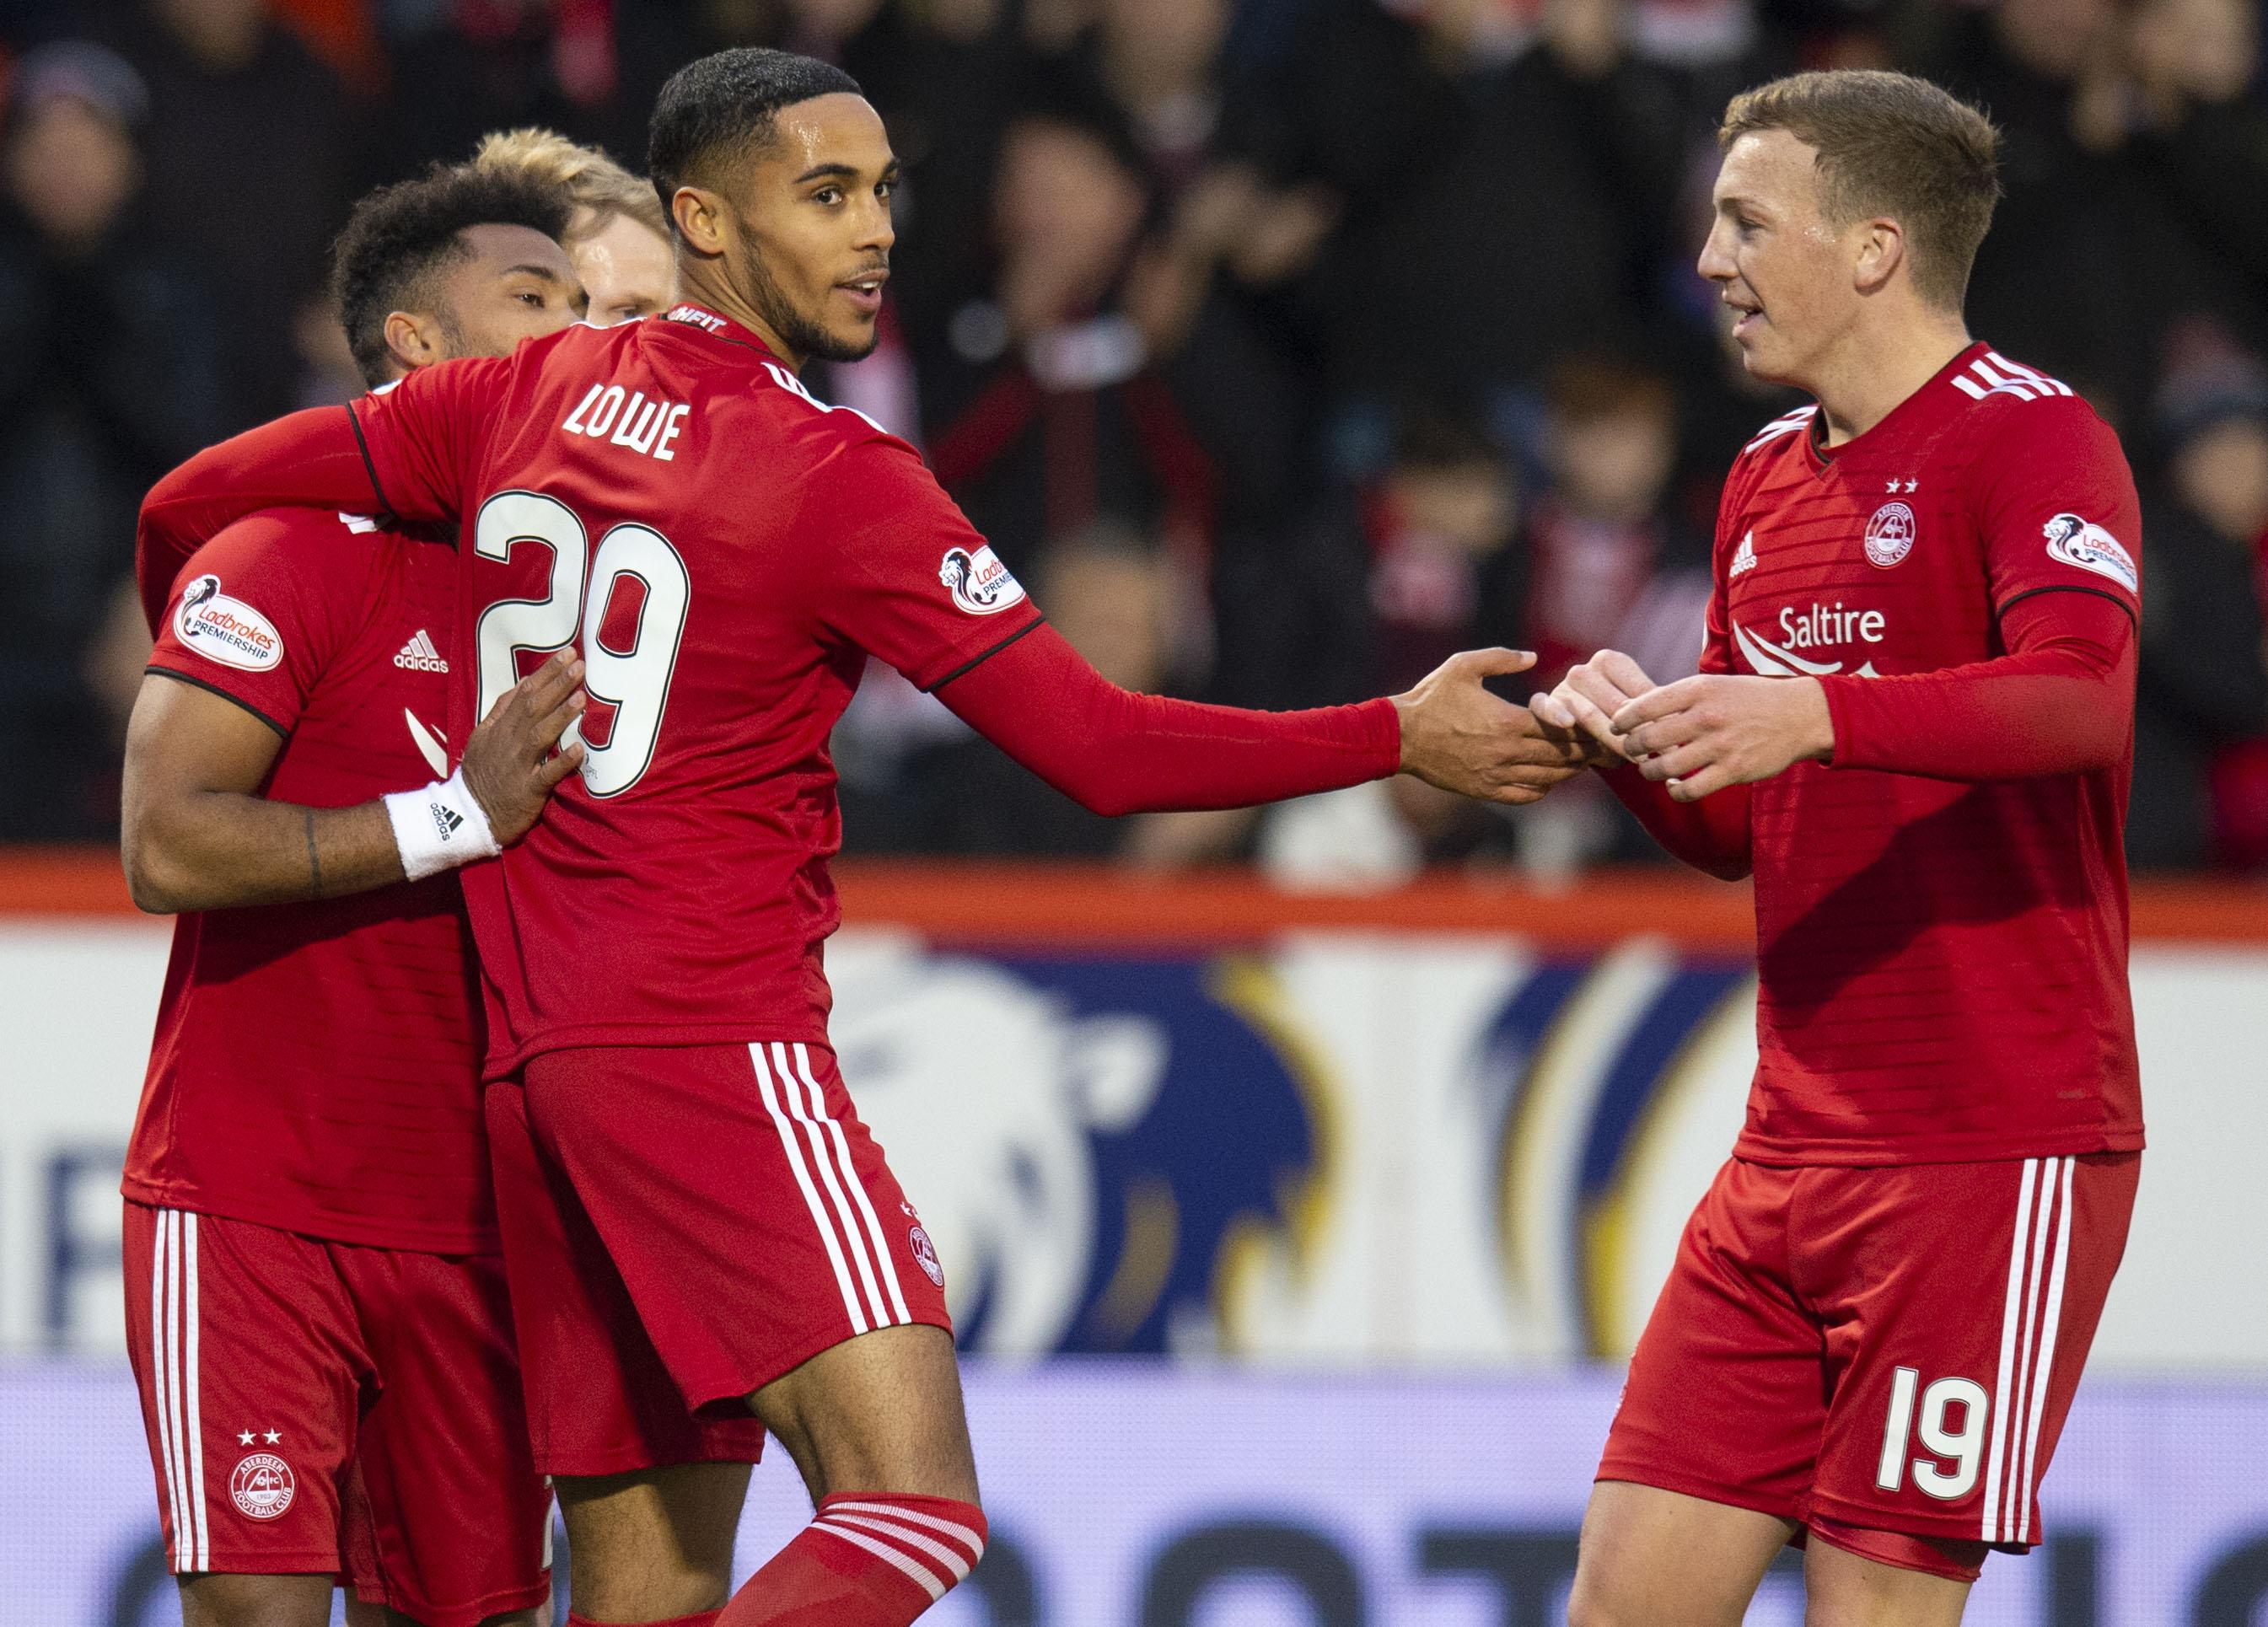 Aberdeen's Max Lowe, left, celebrates his goal.